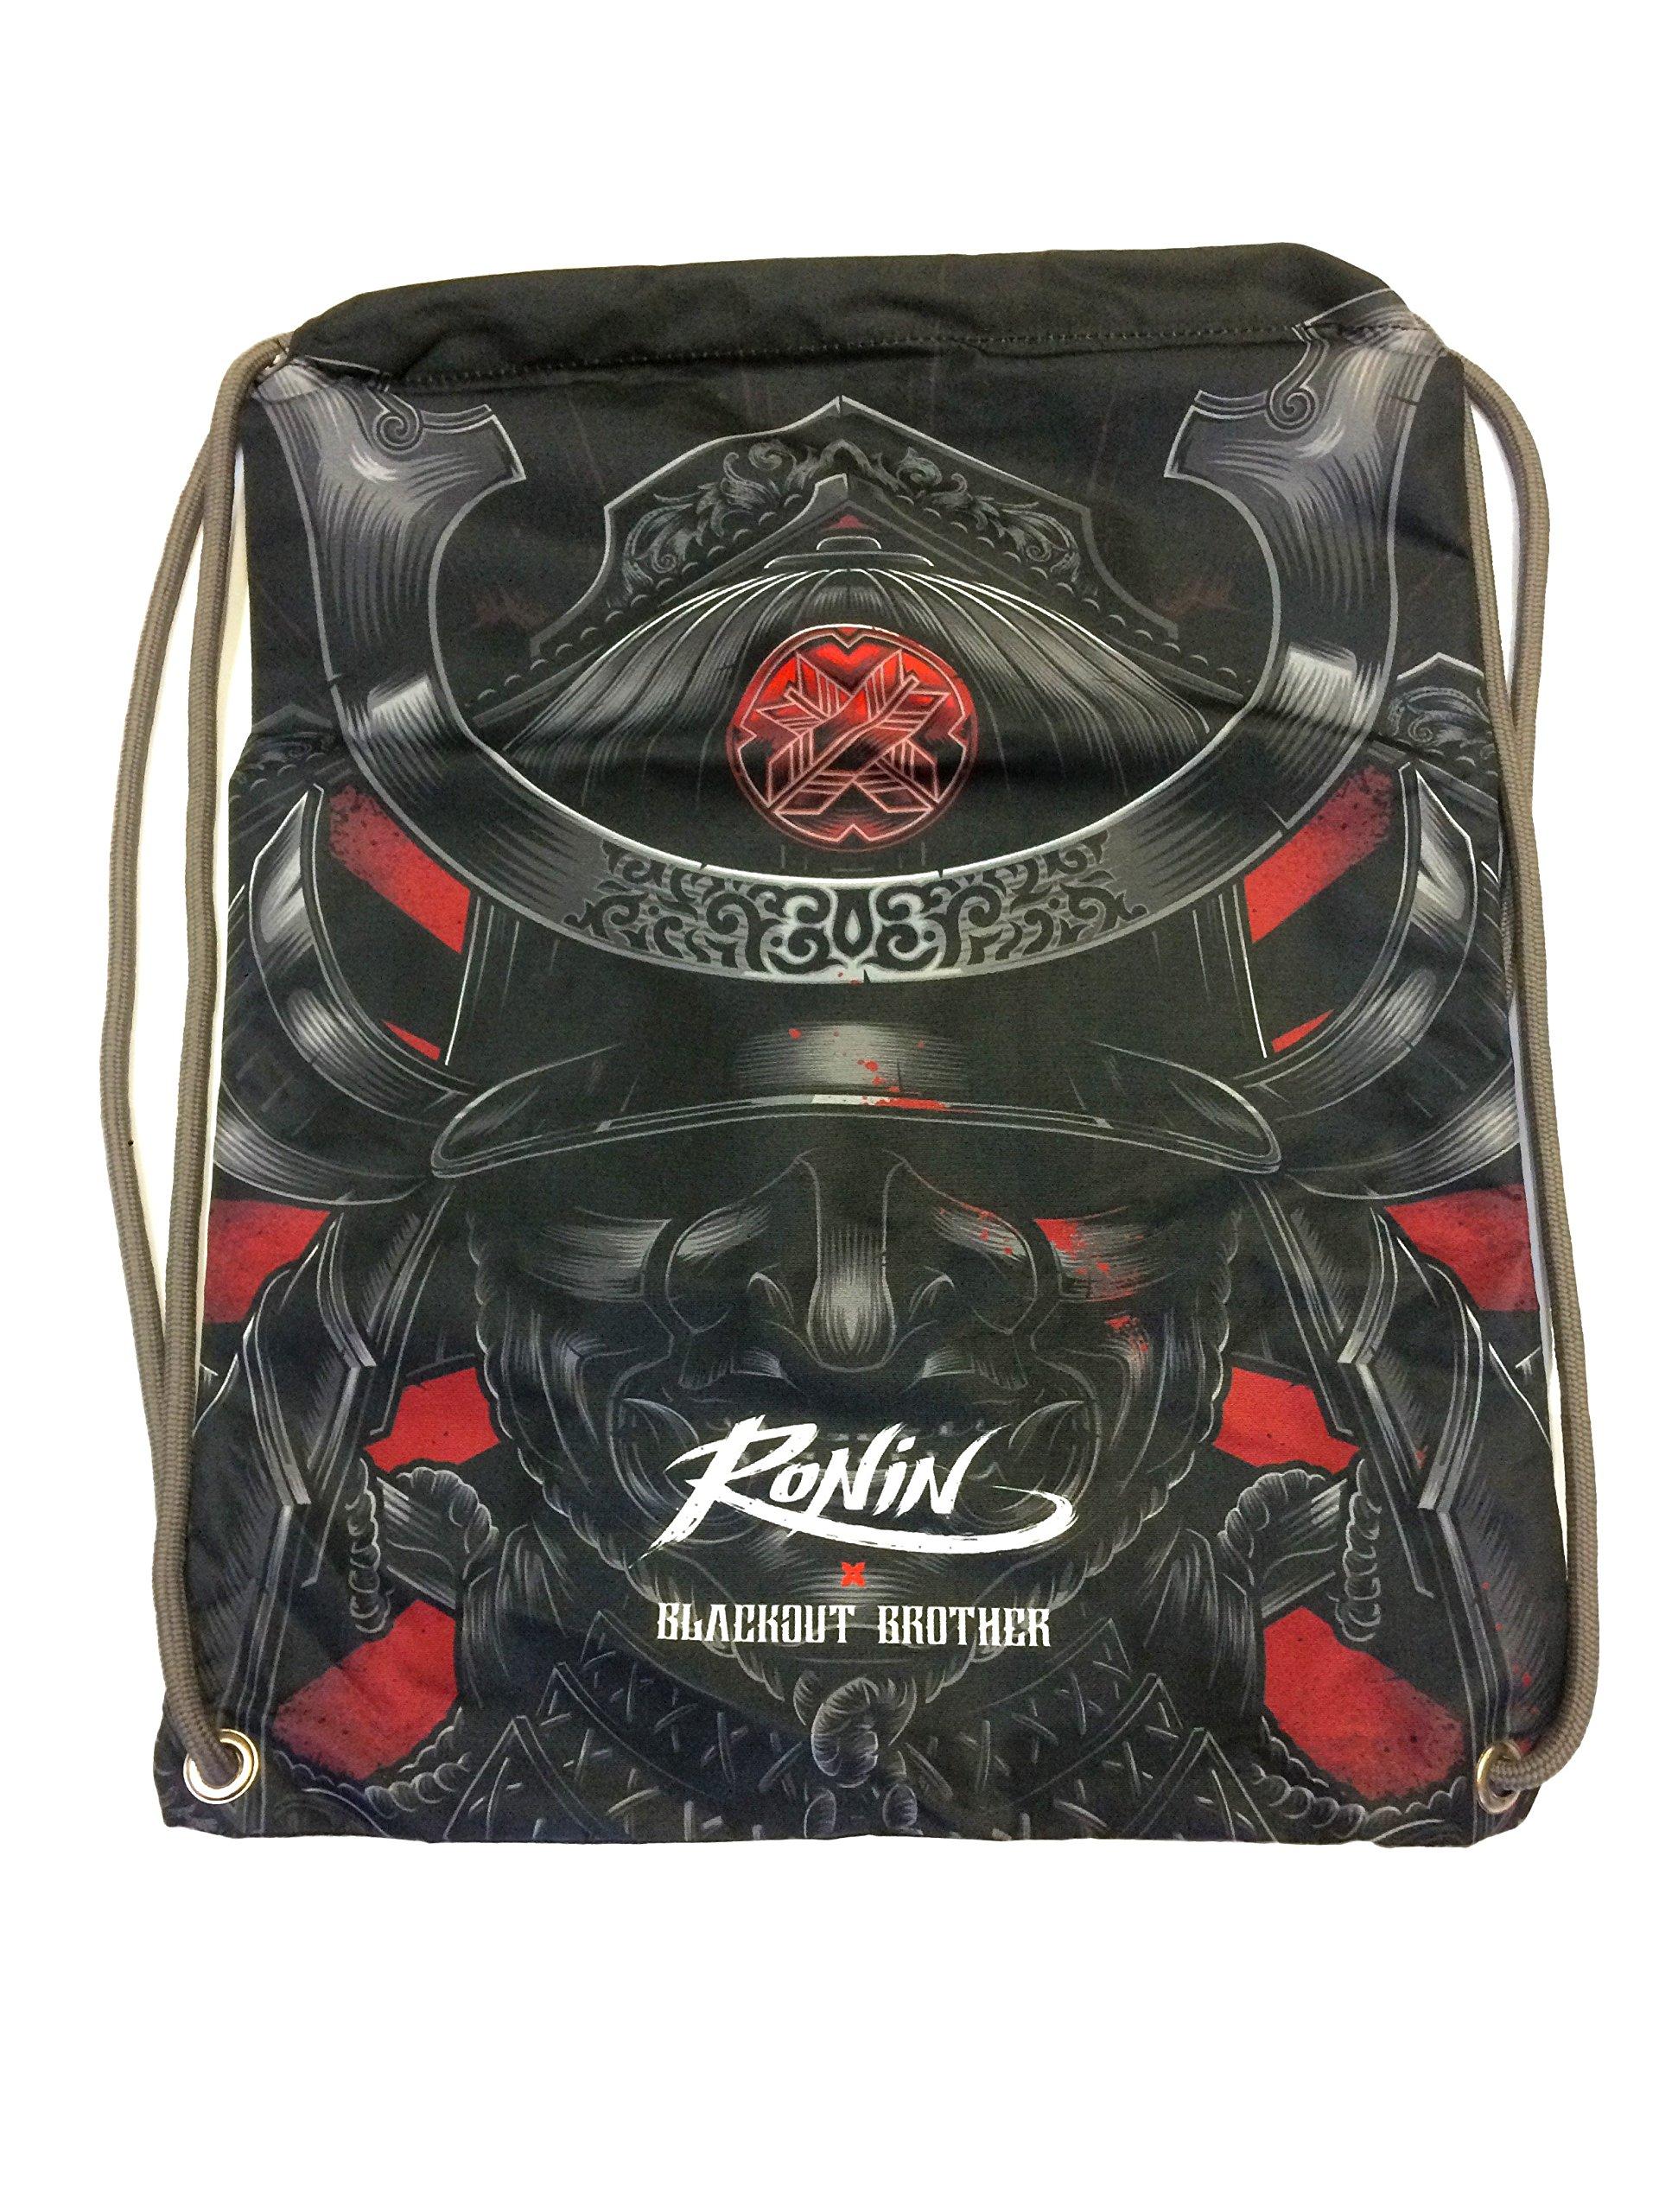 Gi Bag – Ronin Uniform Bag for Karate, Judo, BJJ, TKD & Martial Arts Uniforms - Blackout Samurai Ghost Gi Bag by Ronin Brand (Image #1)